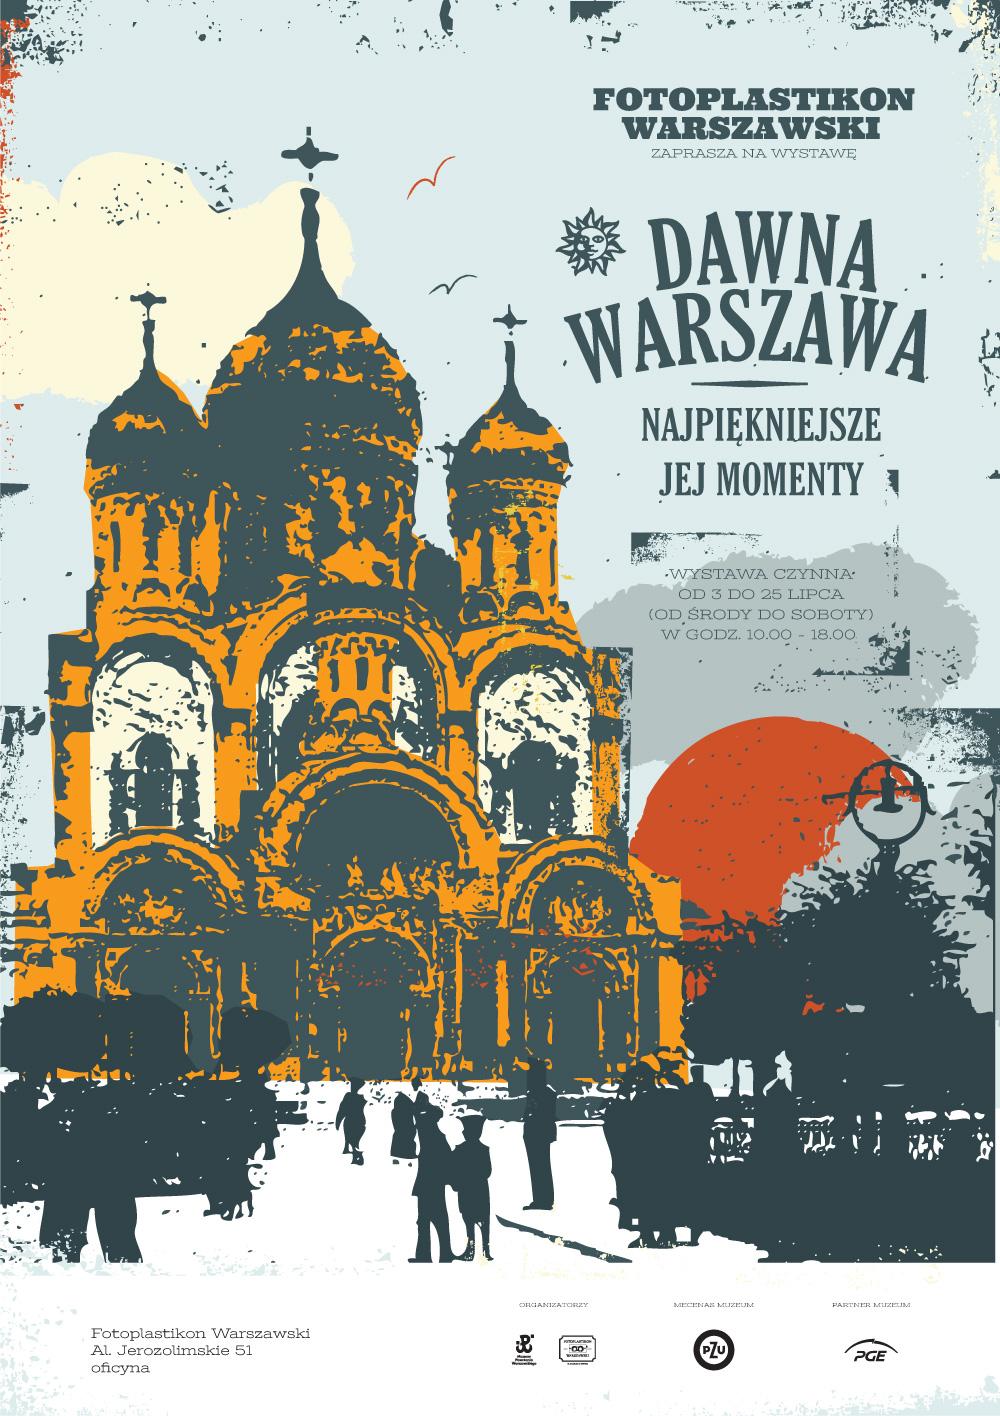 Fotoplastikon-Warszawa